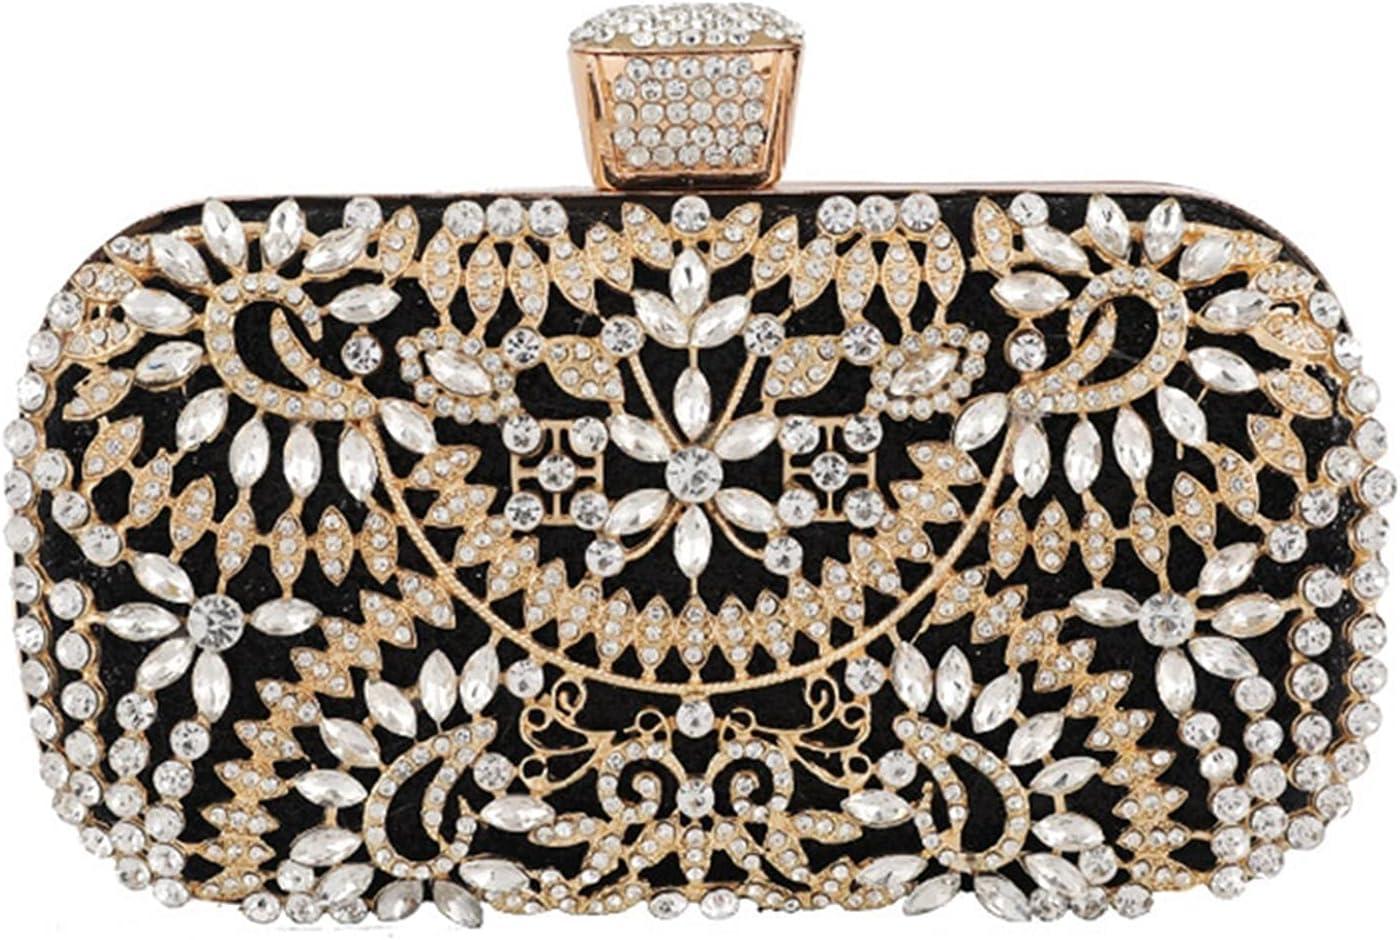 NC Diamond Evening Clutch Bag for Women Wedding Golden Clutch Purse Chain Shoulder Bag Small Party Handbag with Metal Handle (Color : Black A)